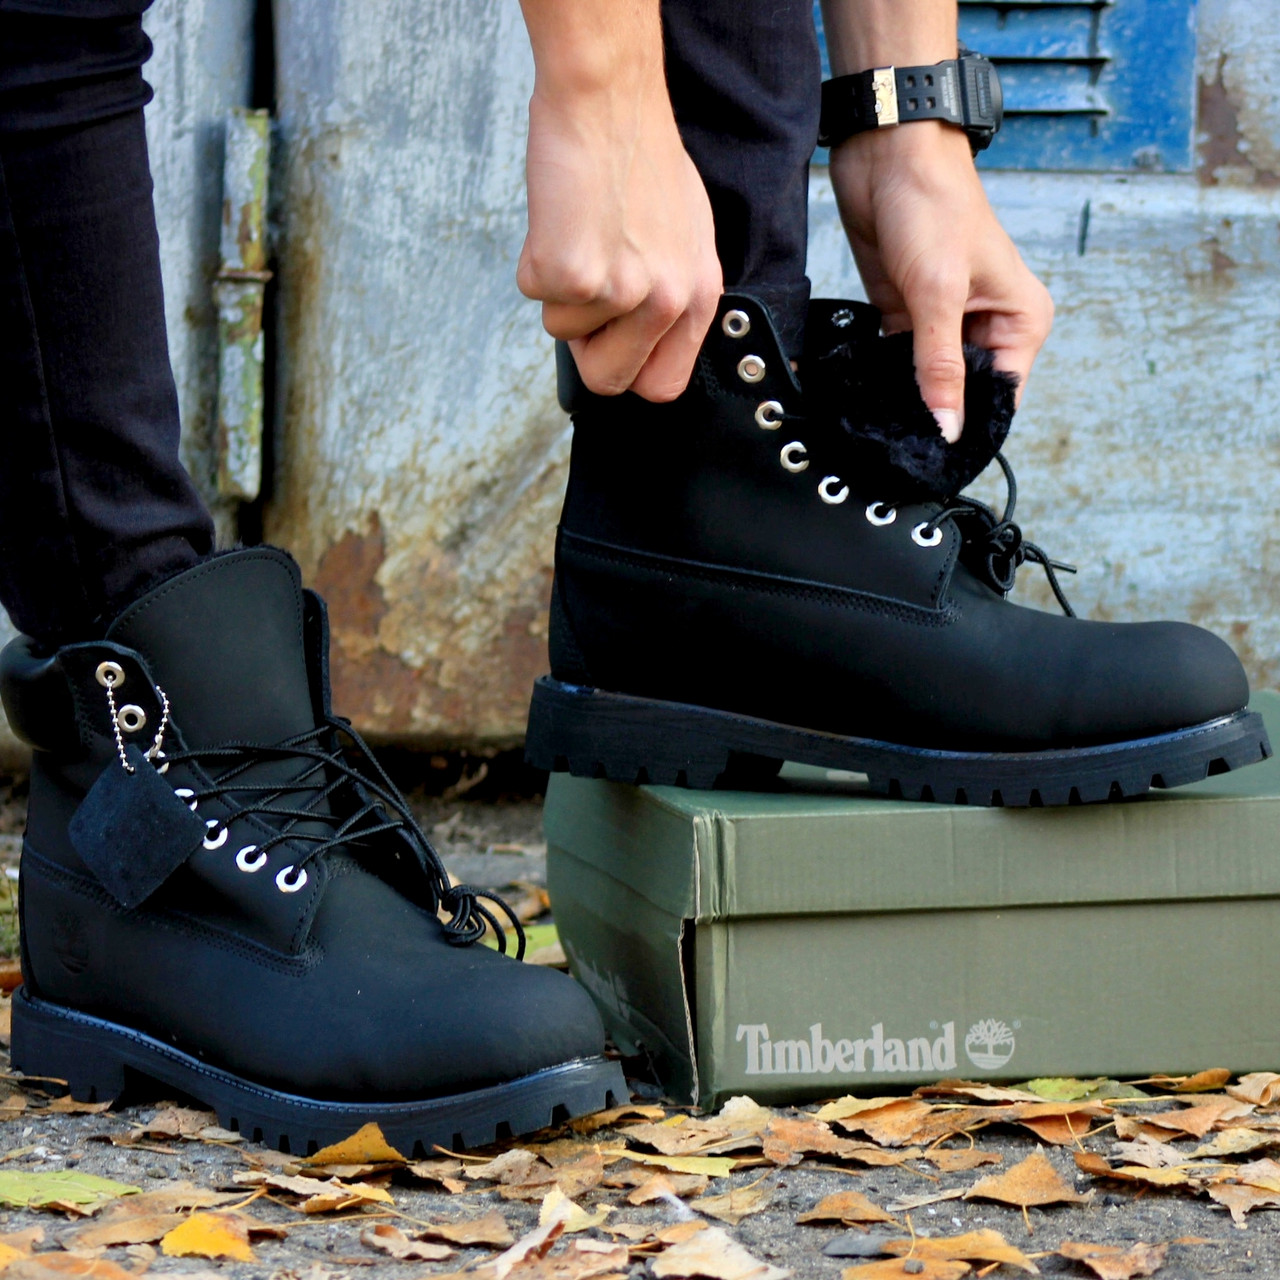 e9c02984208 Ботинки мужские Timberland Classic Boots (черные) МЕХ! Top replic - BE  SMILE молодежный